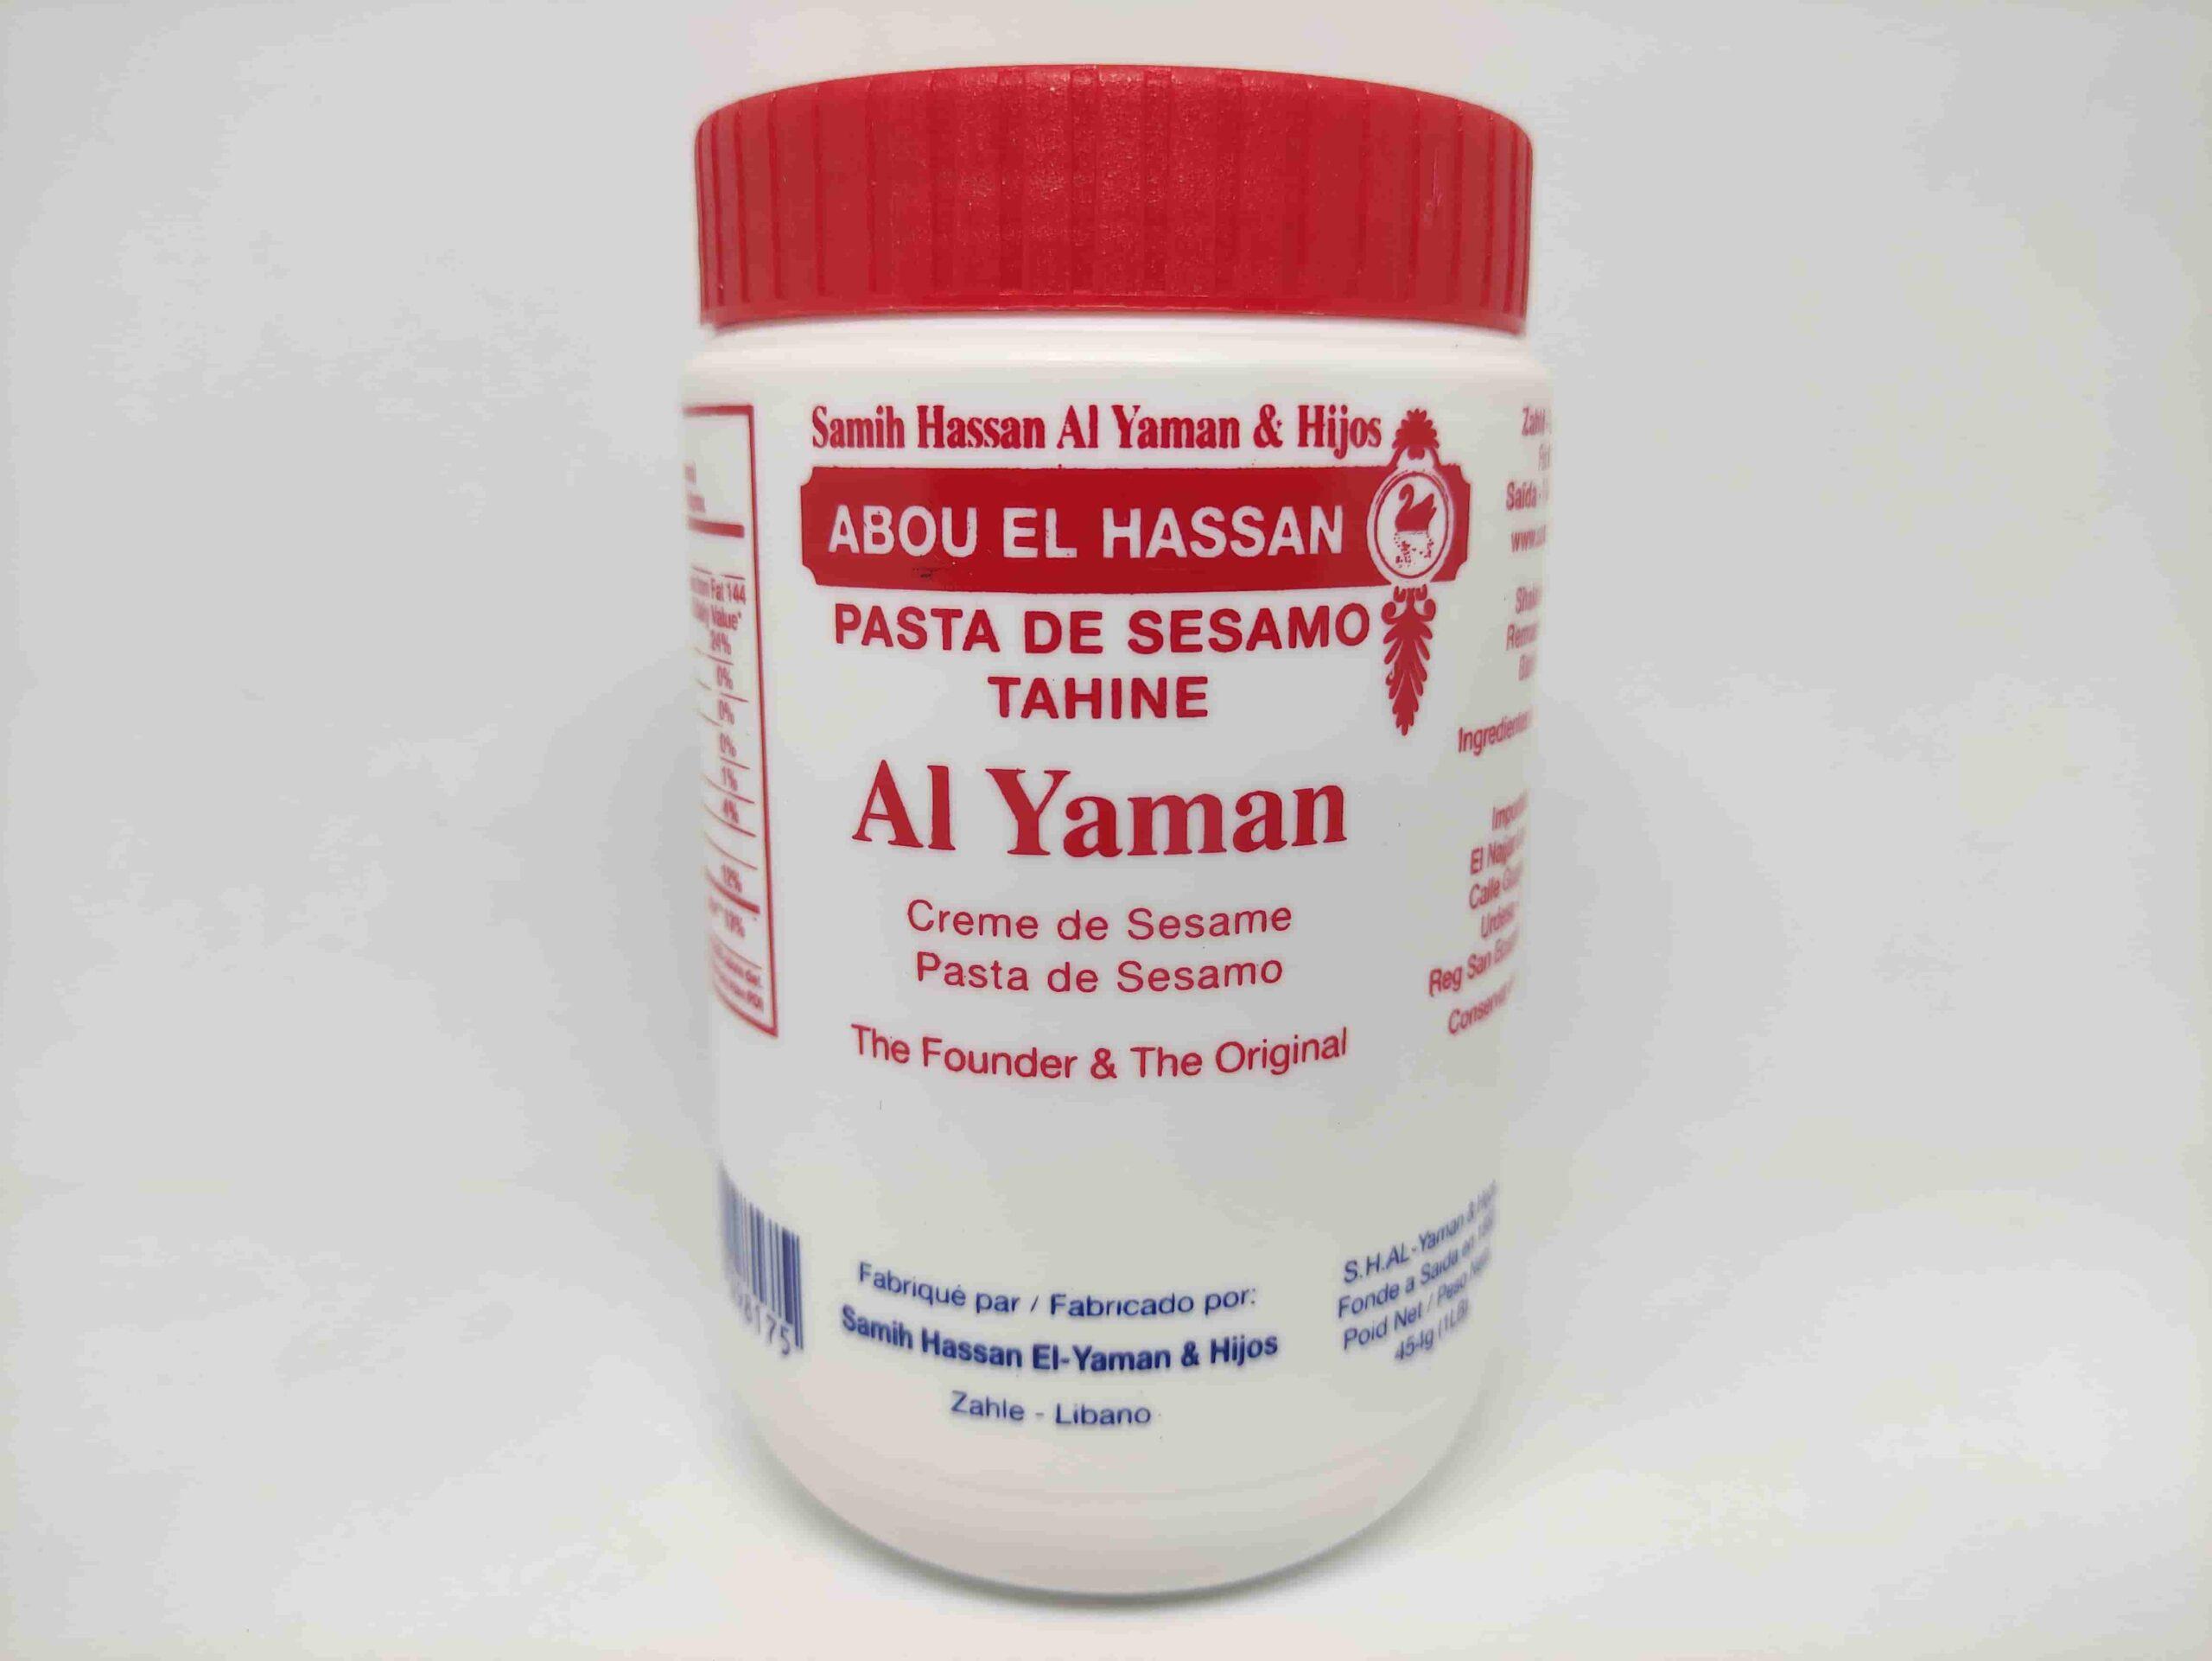 Tahini Samih Hassan Al Yaman & Hijos